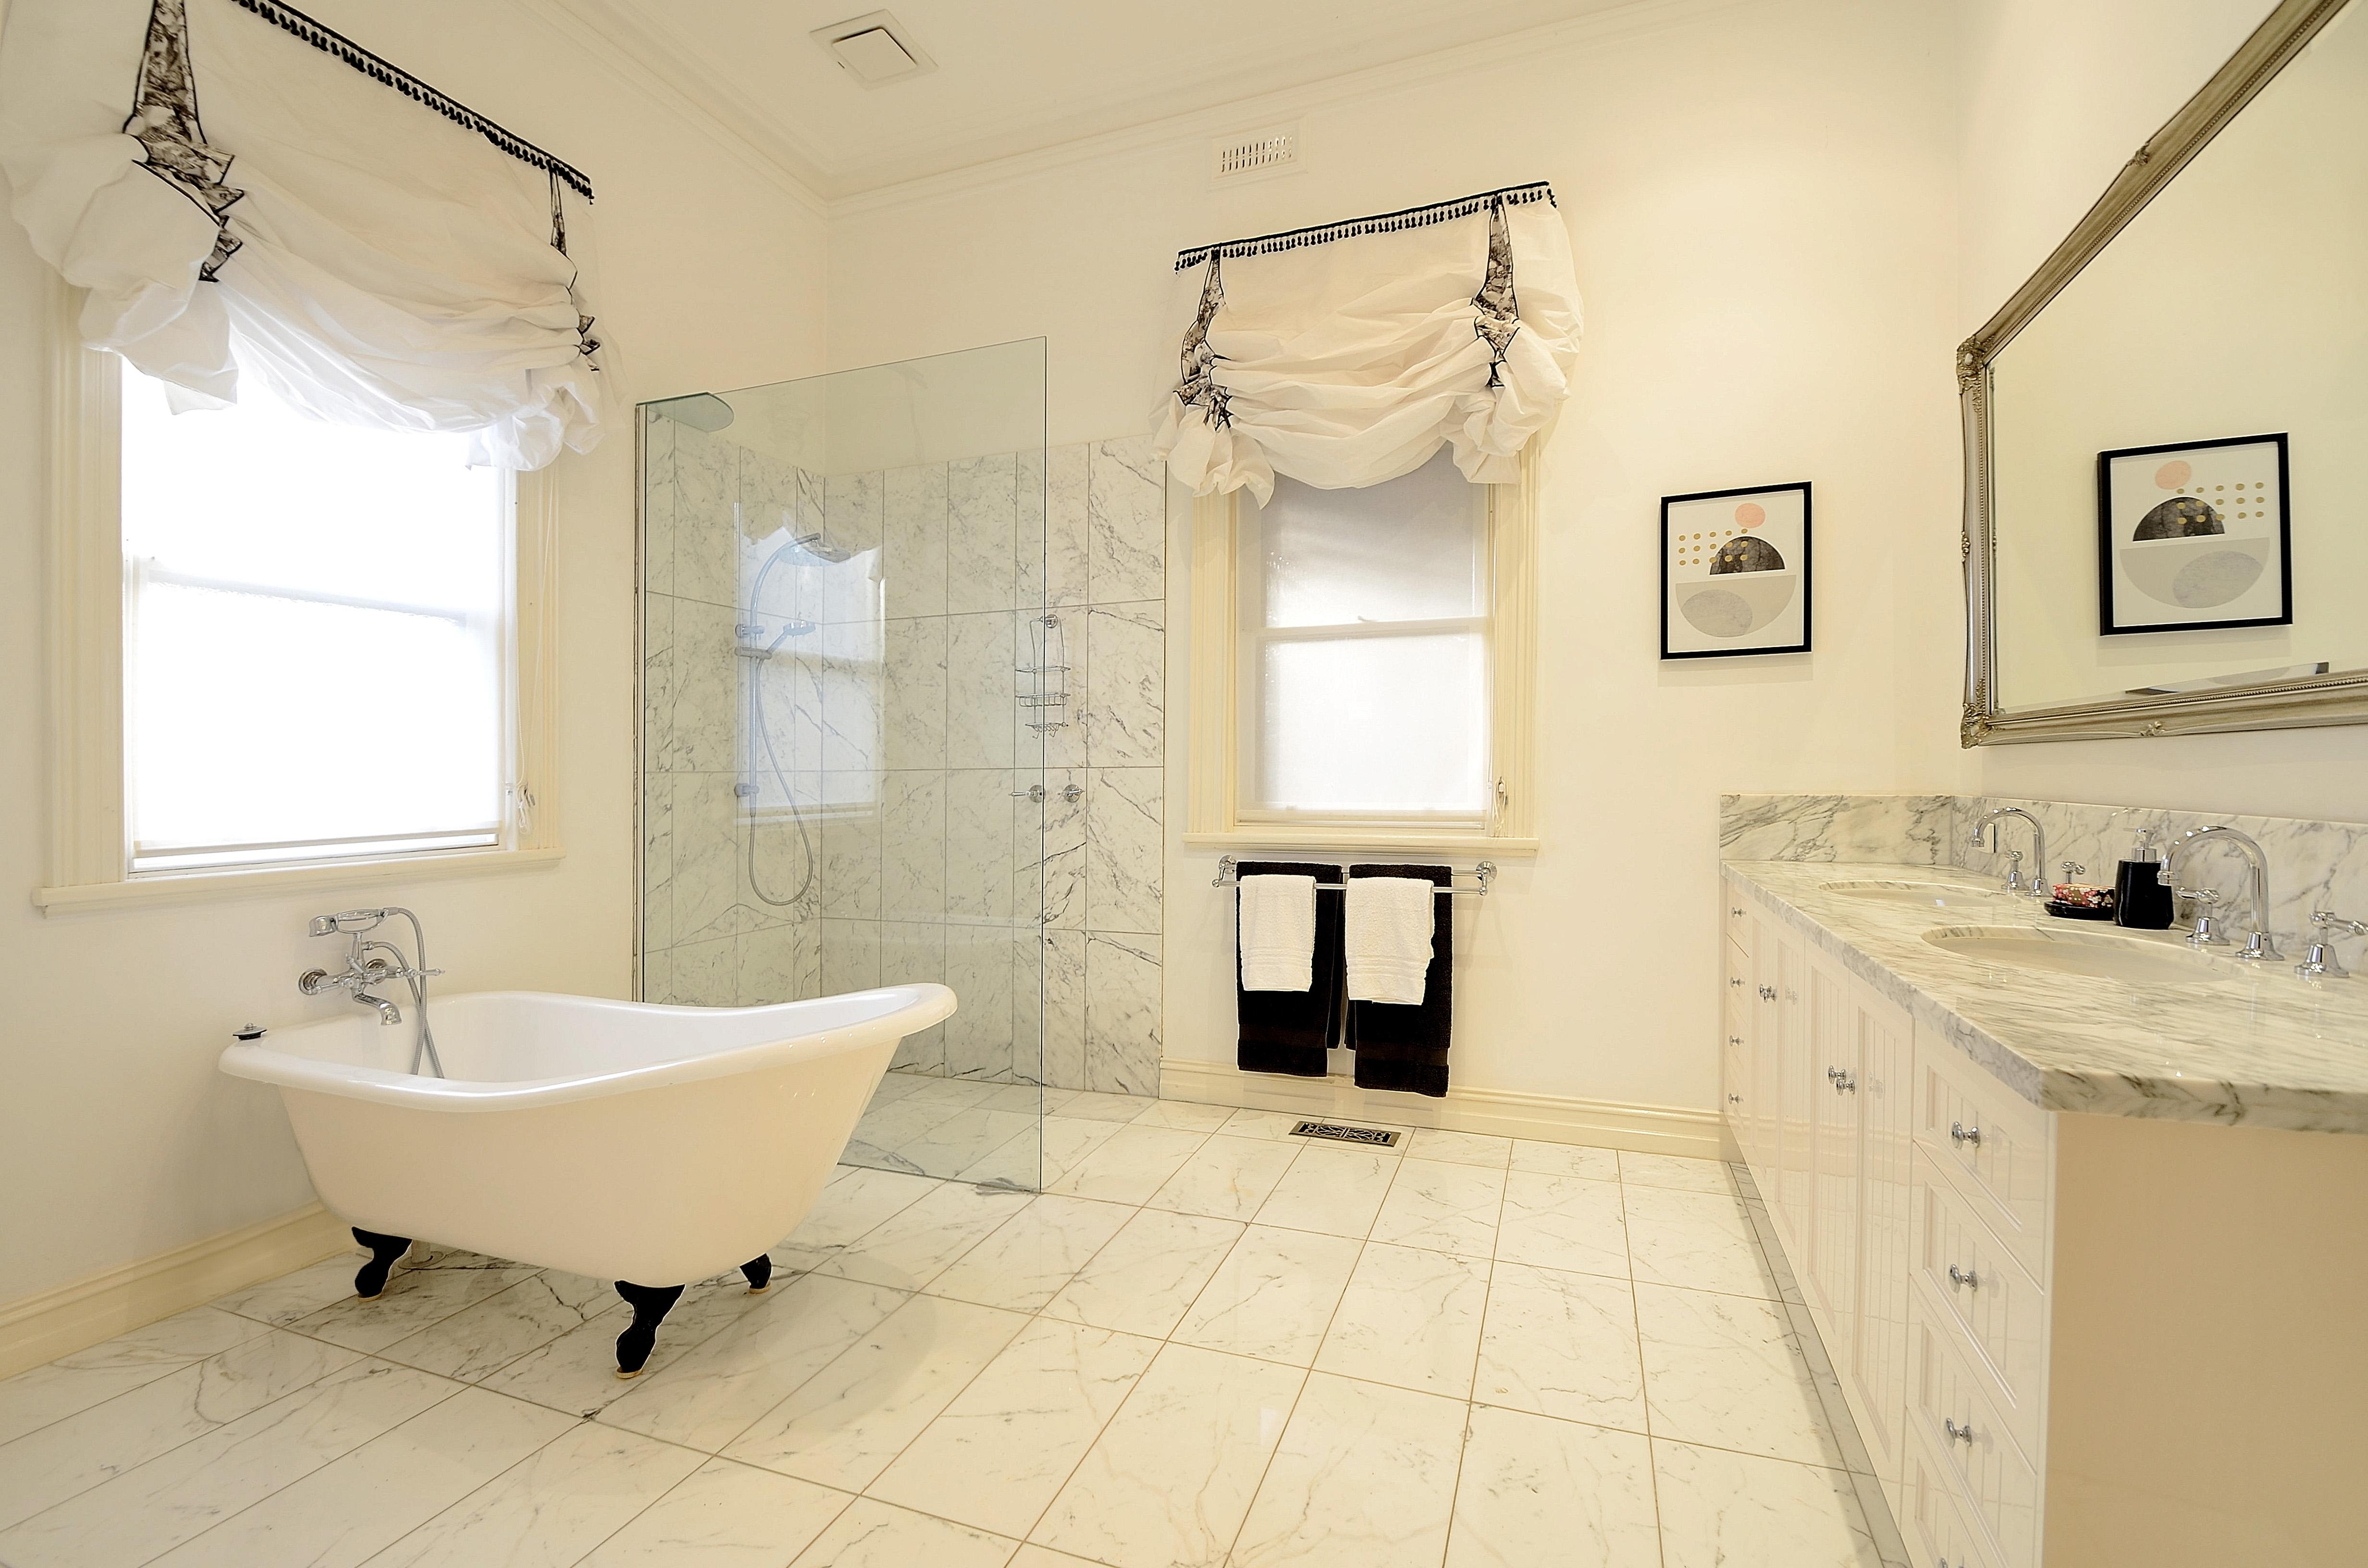 42 Langmore bathroom